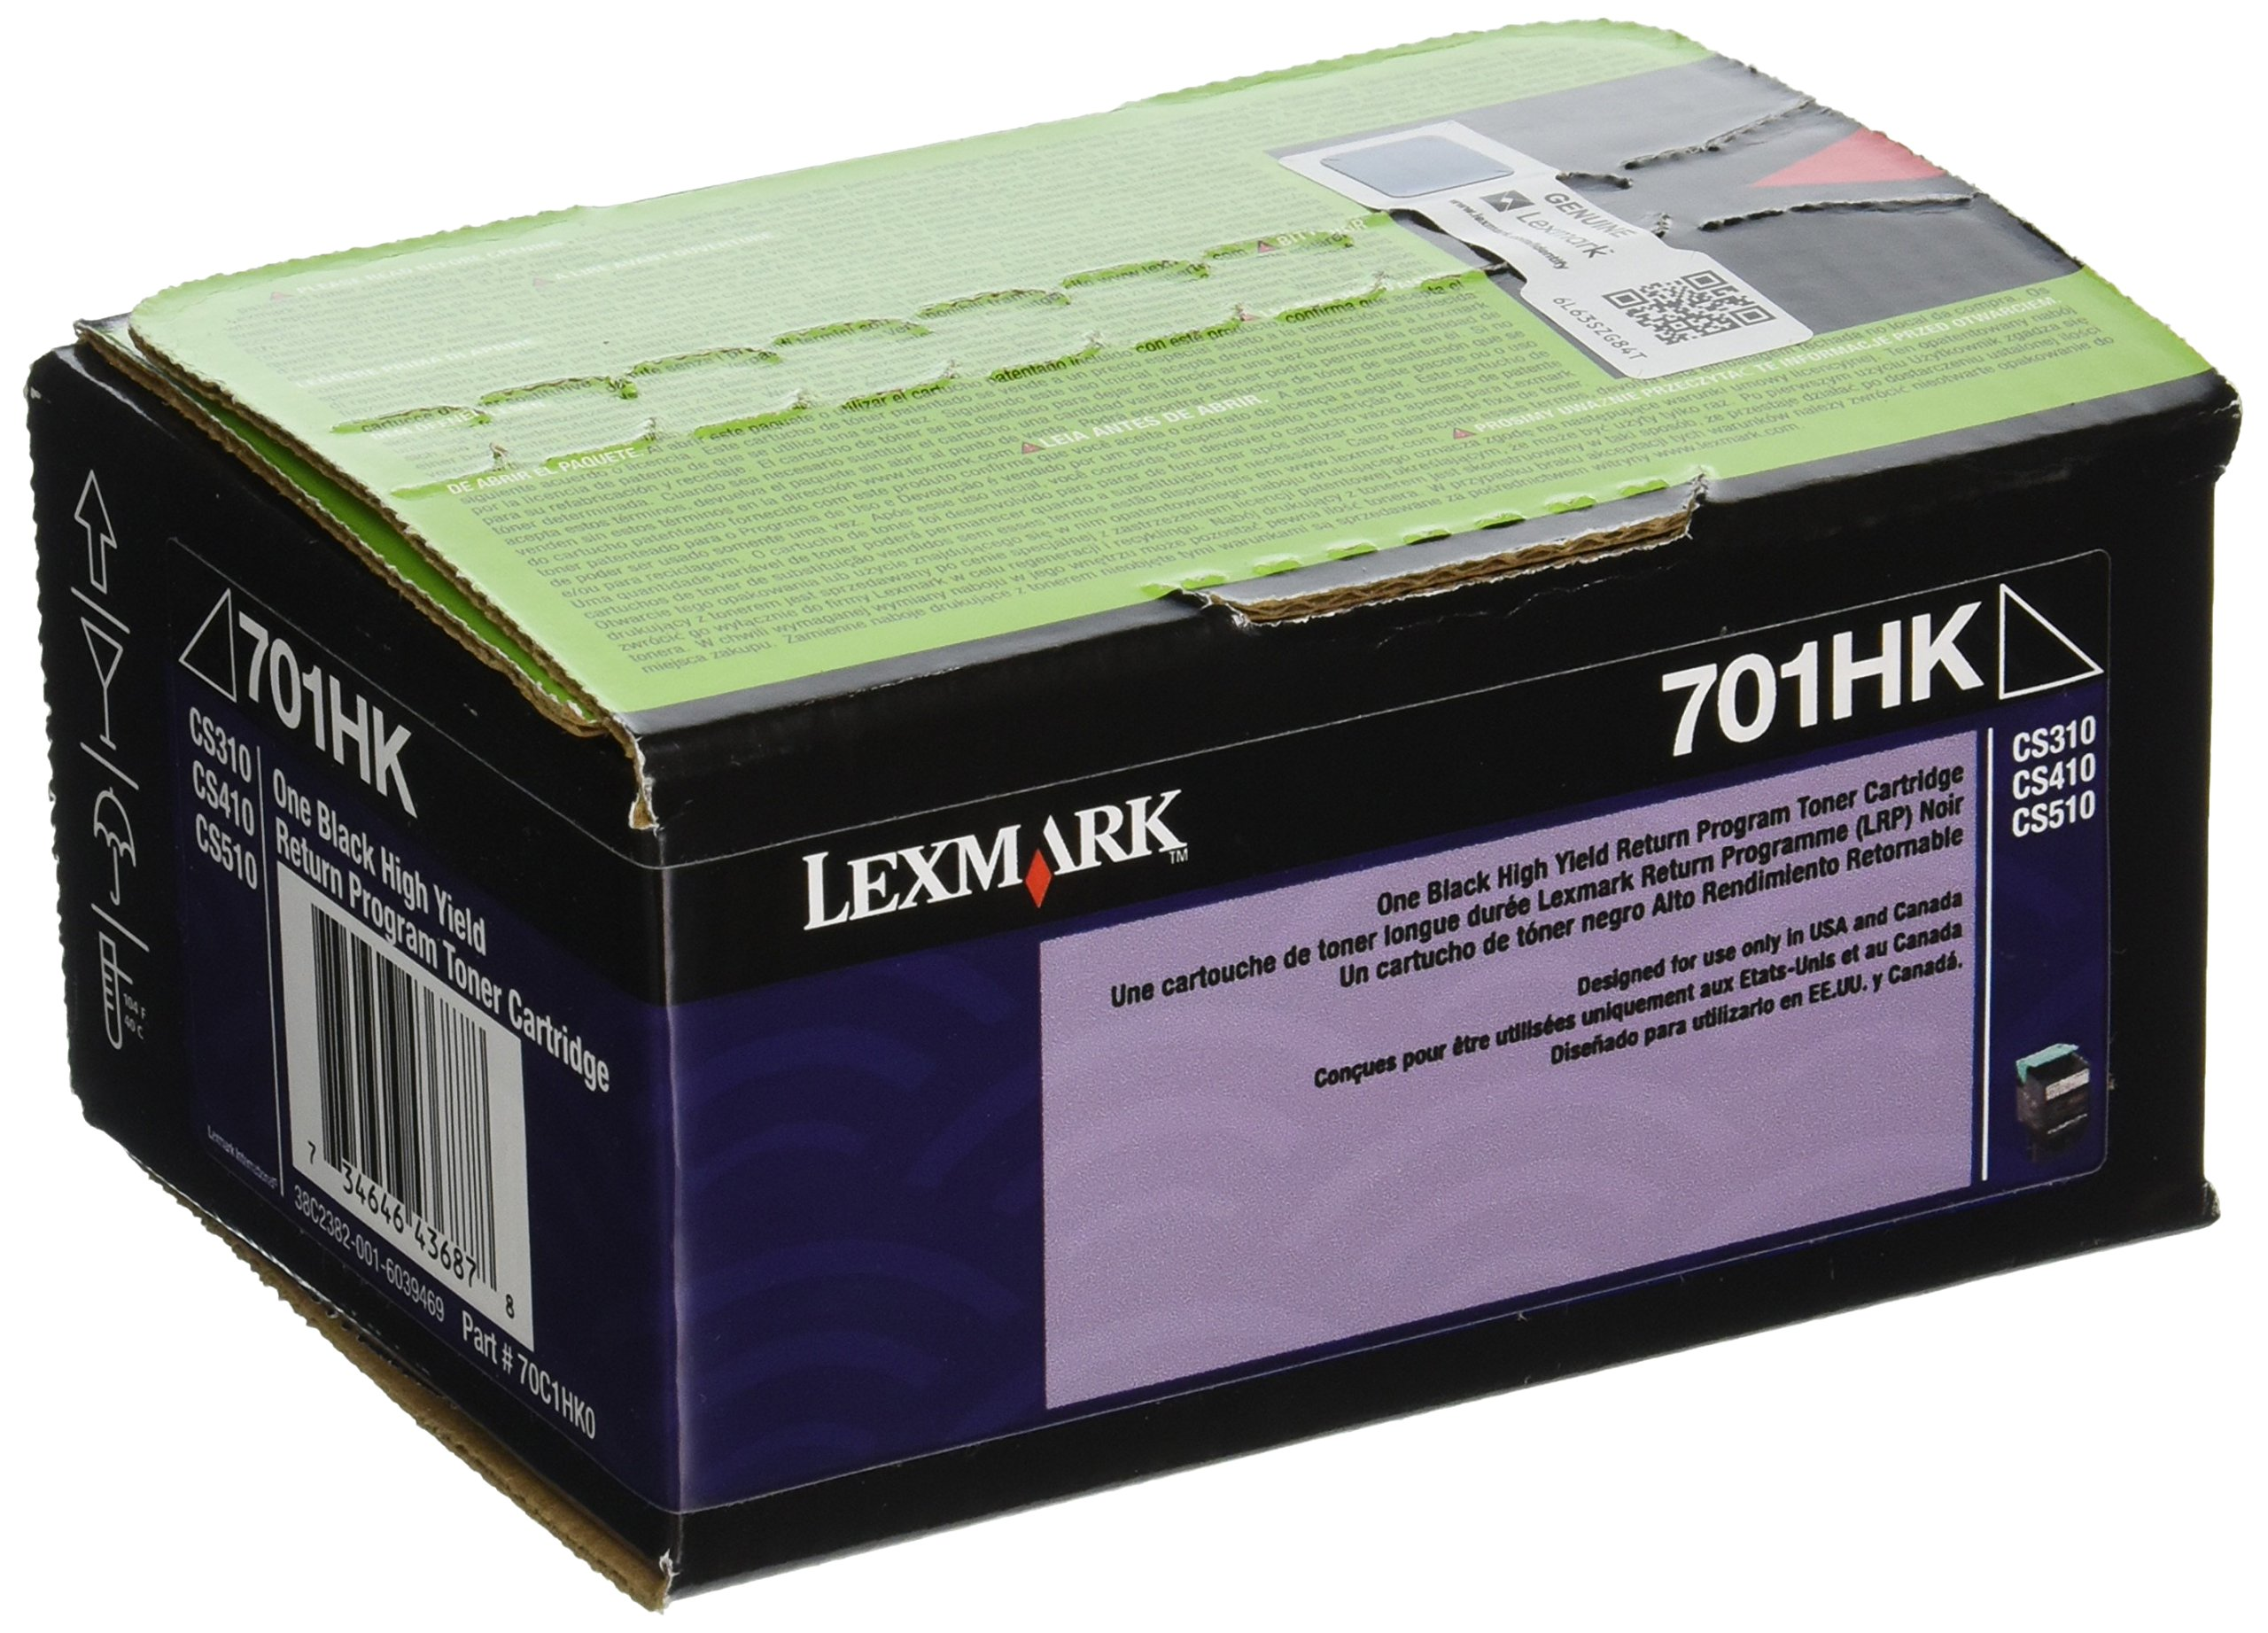 Lexmark 70C1HK0 701HK CS310, CS410, CS510 Black High Yield Return Program Toner Cartridge